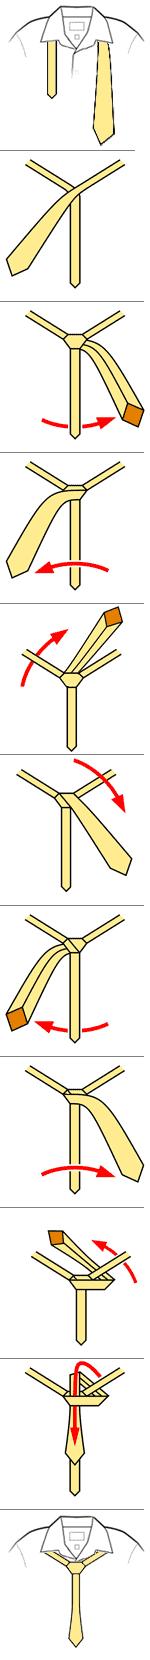 Cavendish Knot Instructions